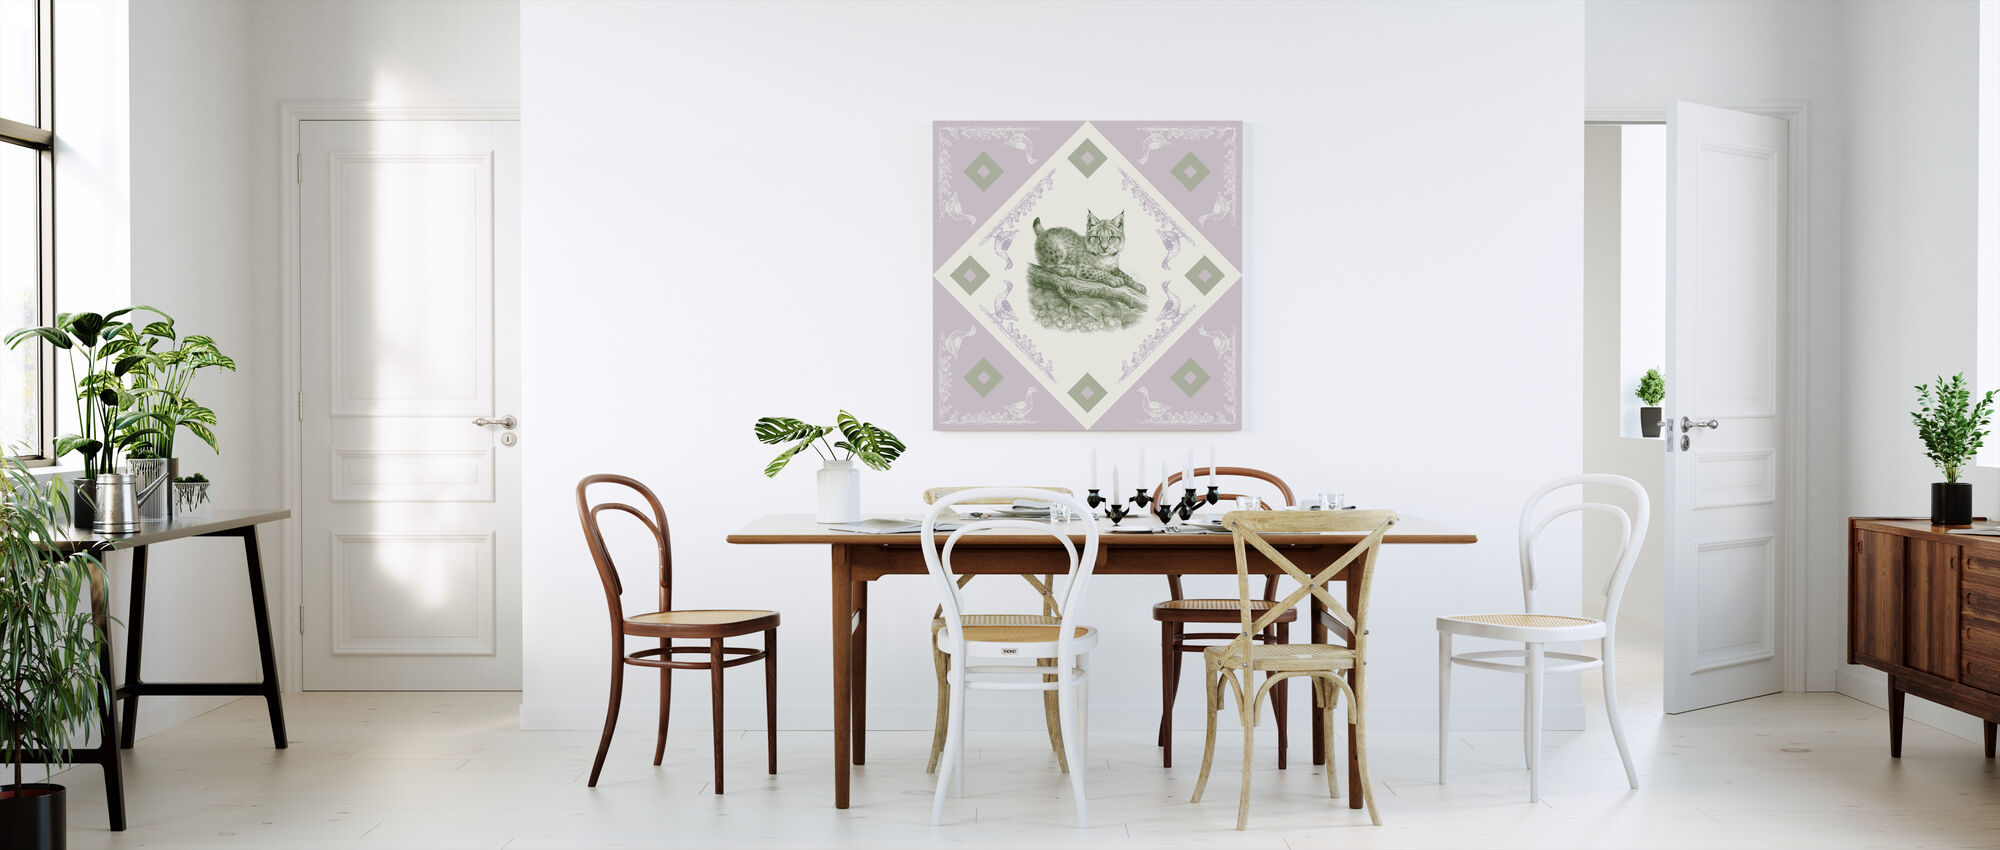 Ilves, Vihreä Violetti - Canvastaulu - Keittiö